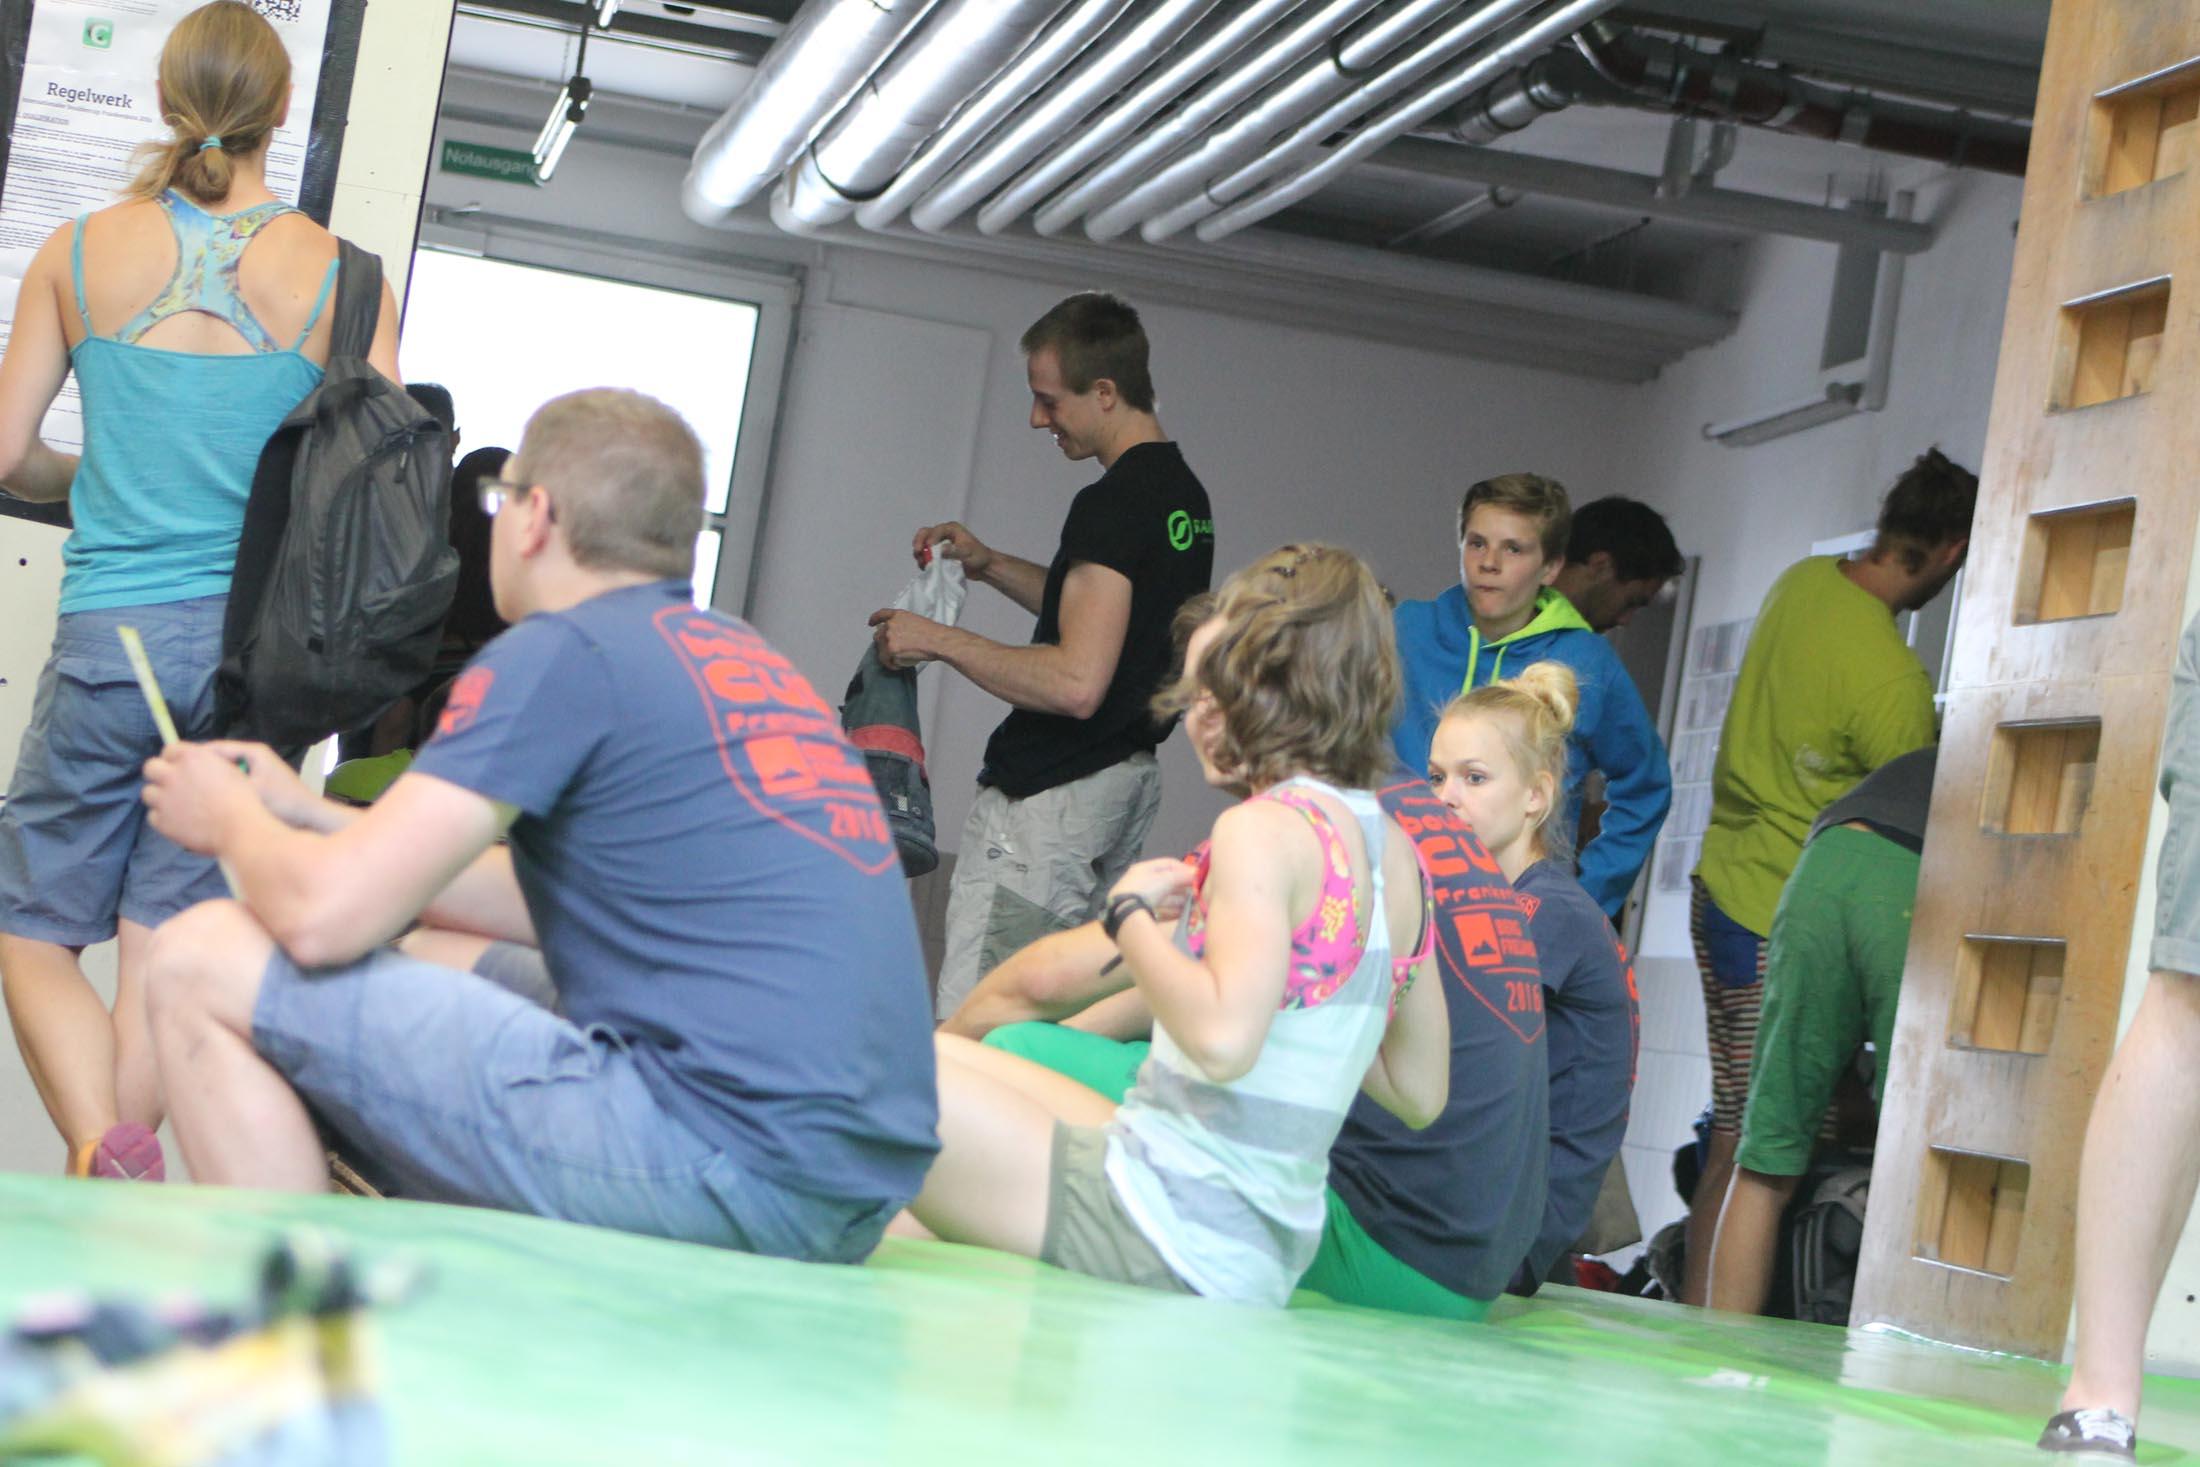 Registration internationaler bouldercup Frankenjura 2016, BLOCKHELDEN Erlangen, Mammut, Bergfreunde.de, Boulderwettkampf07092016084